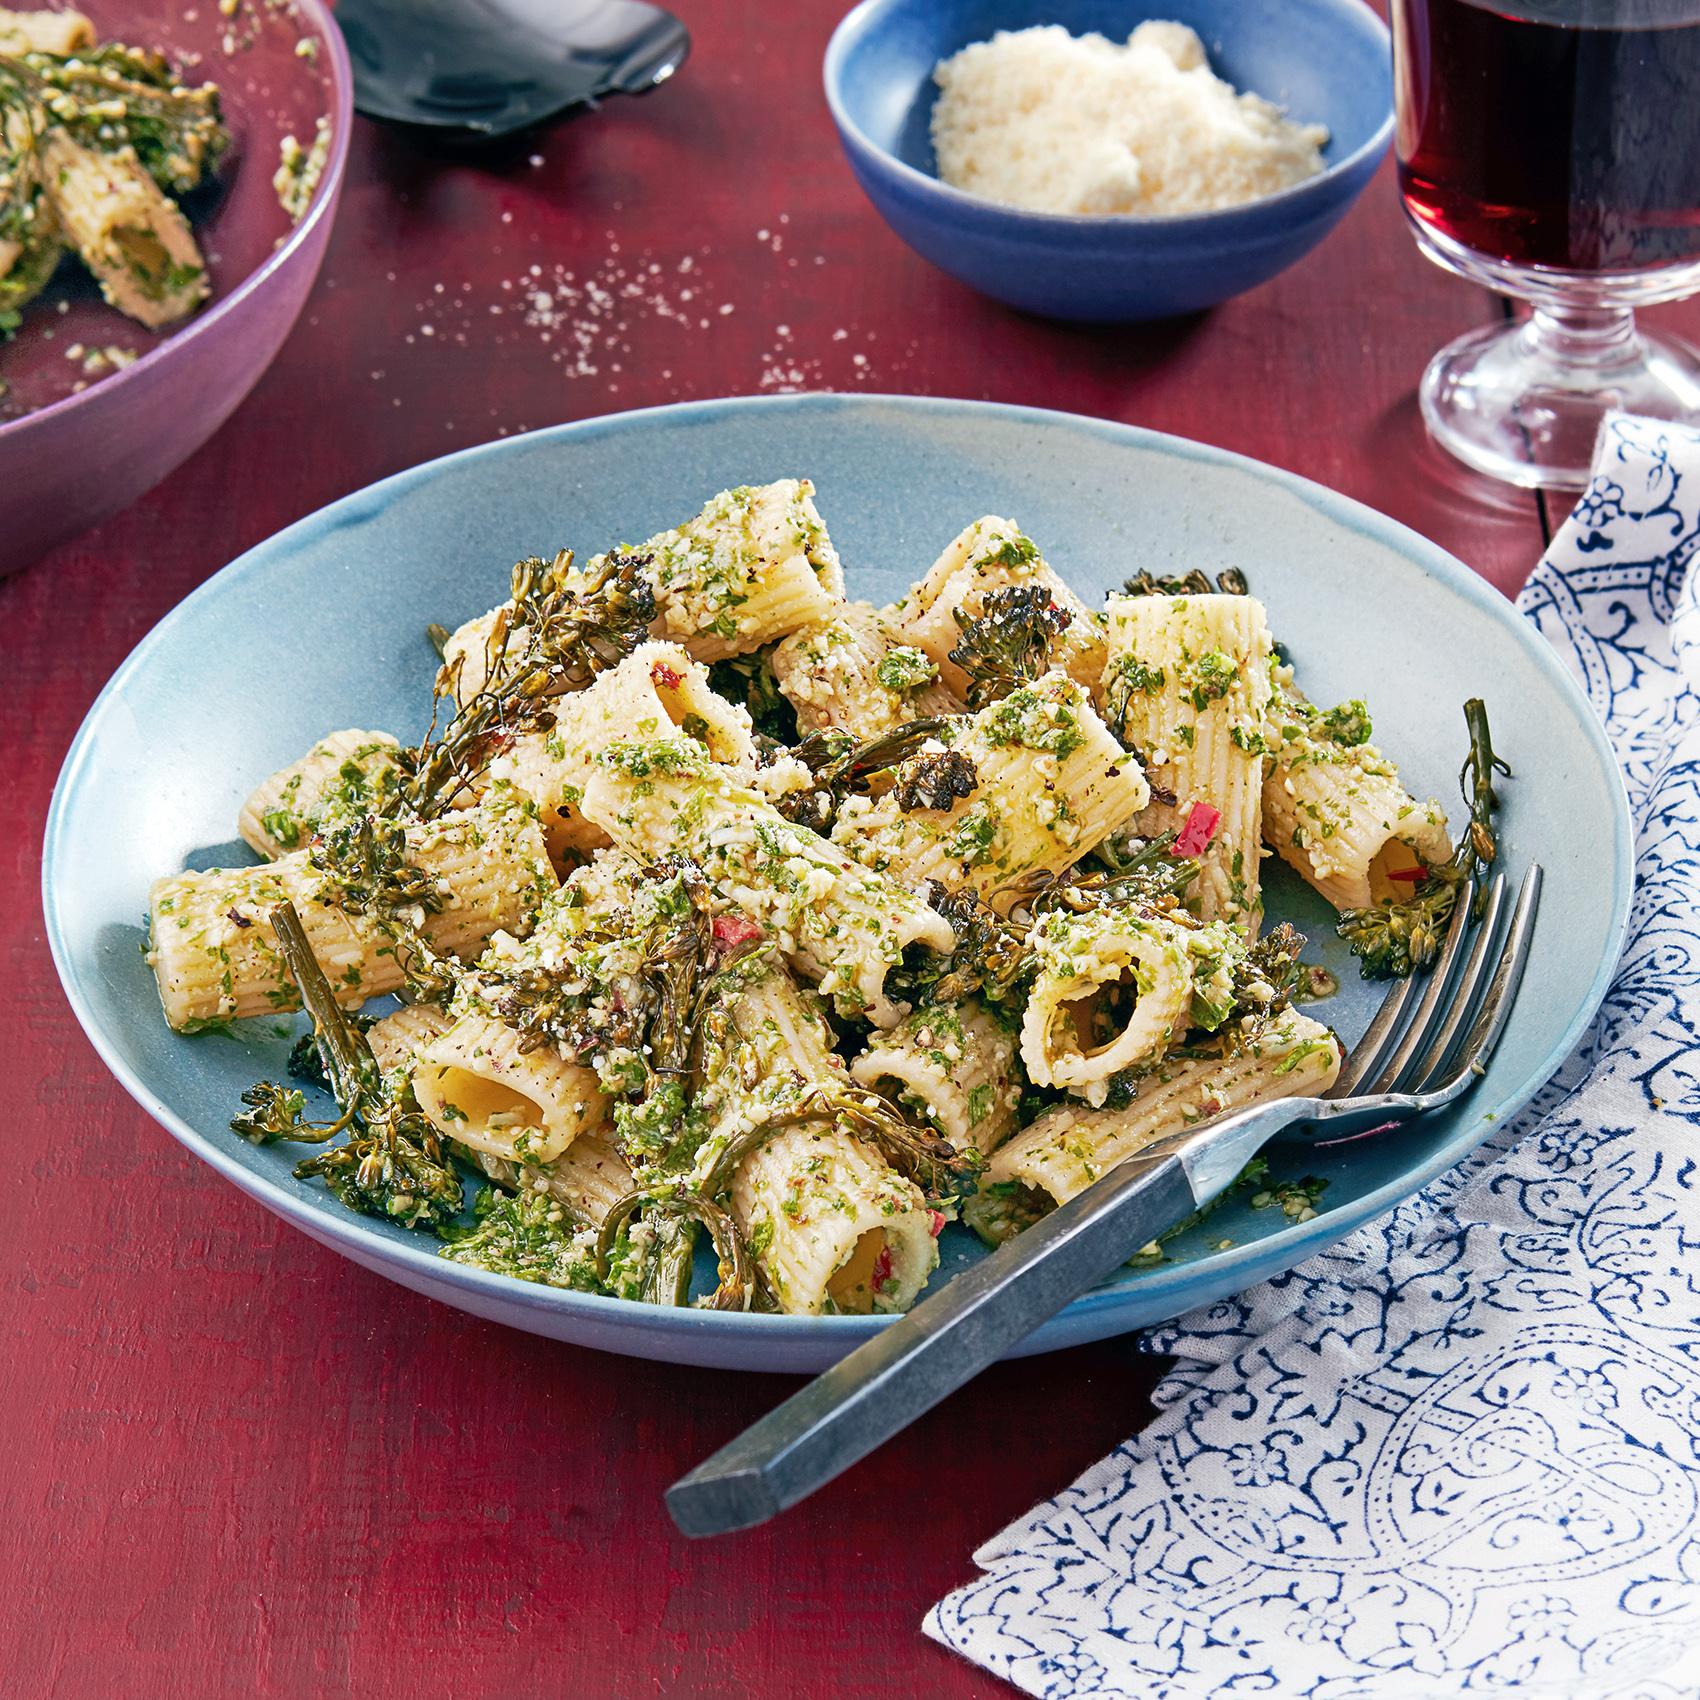 roasted broccolini riggies with walnut pesto